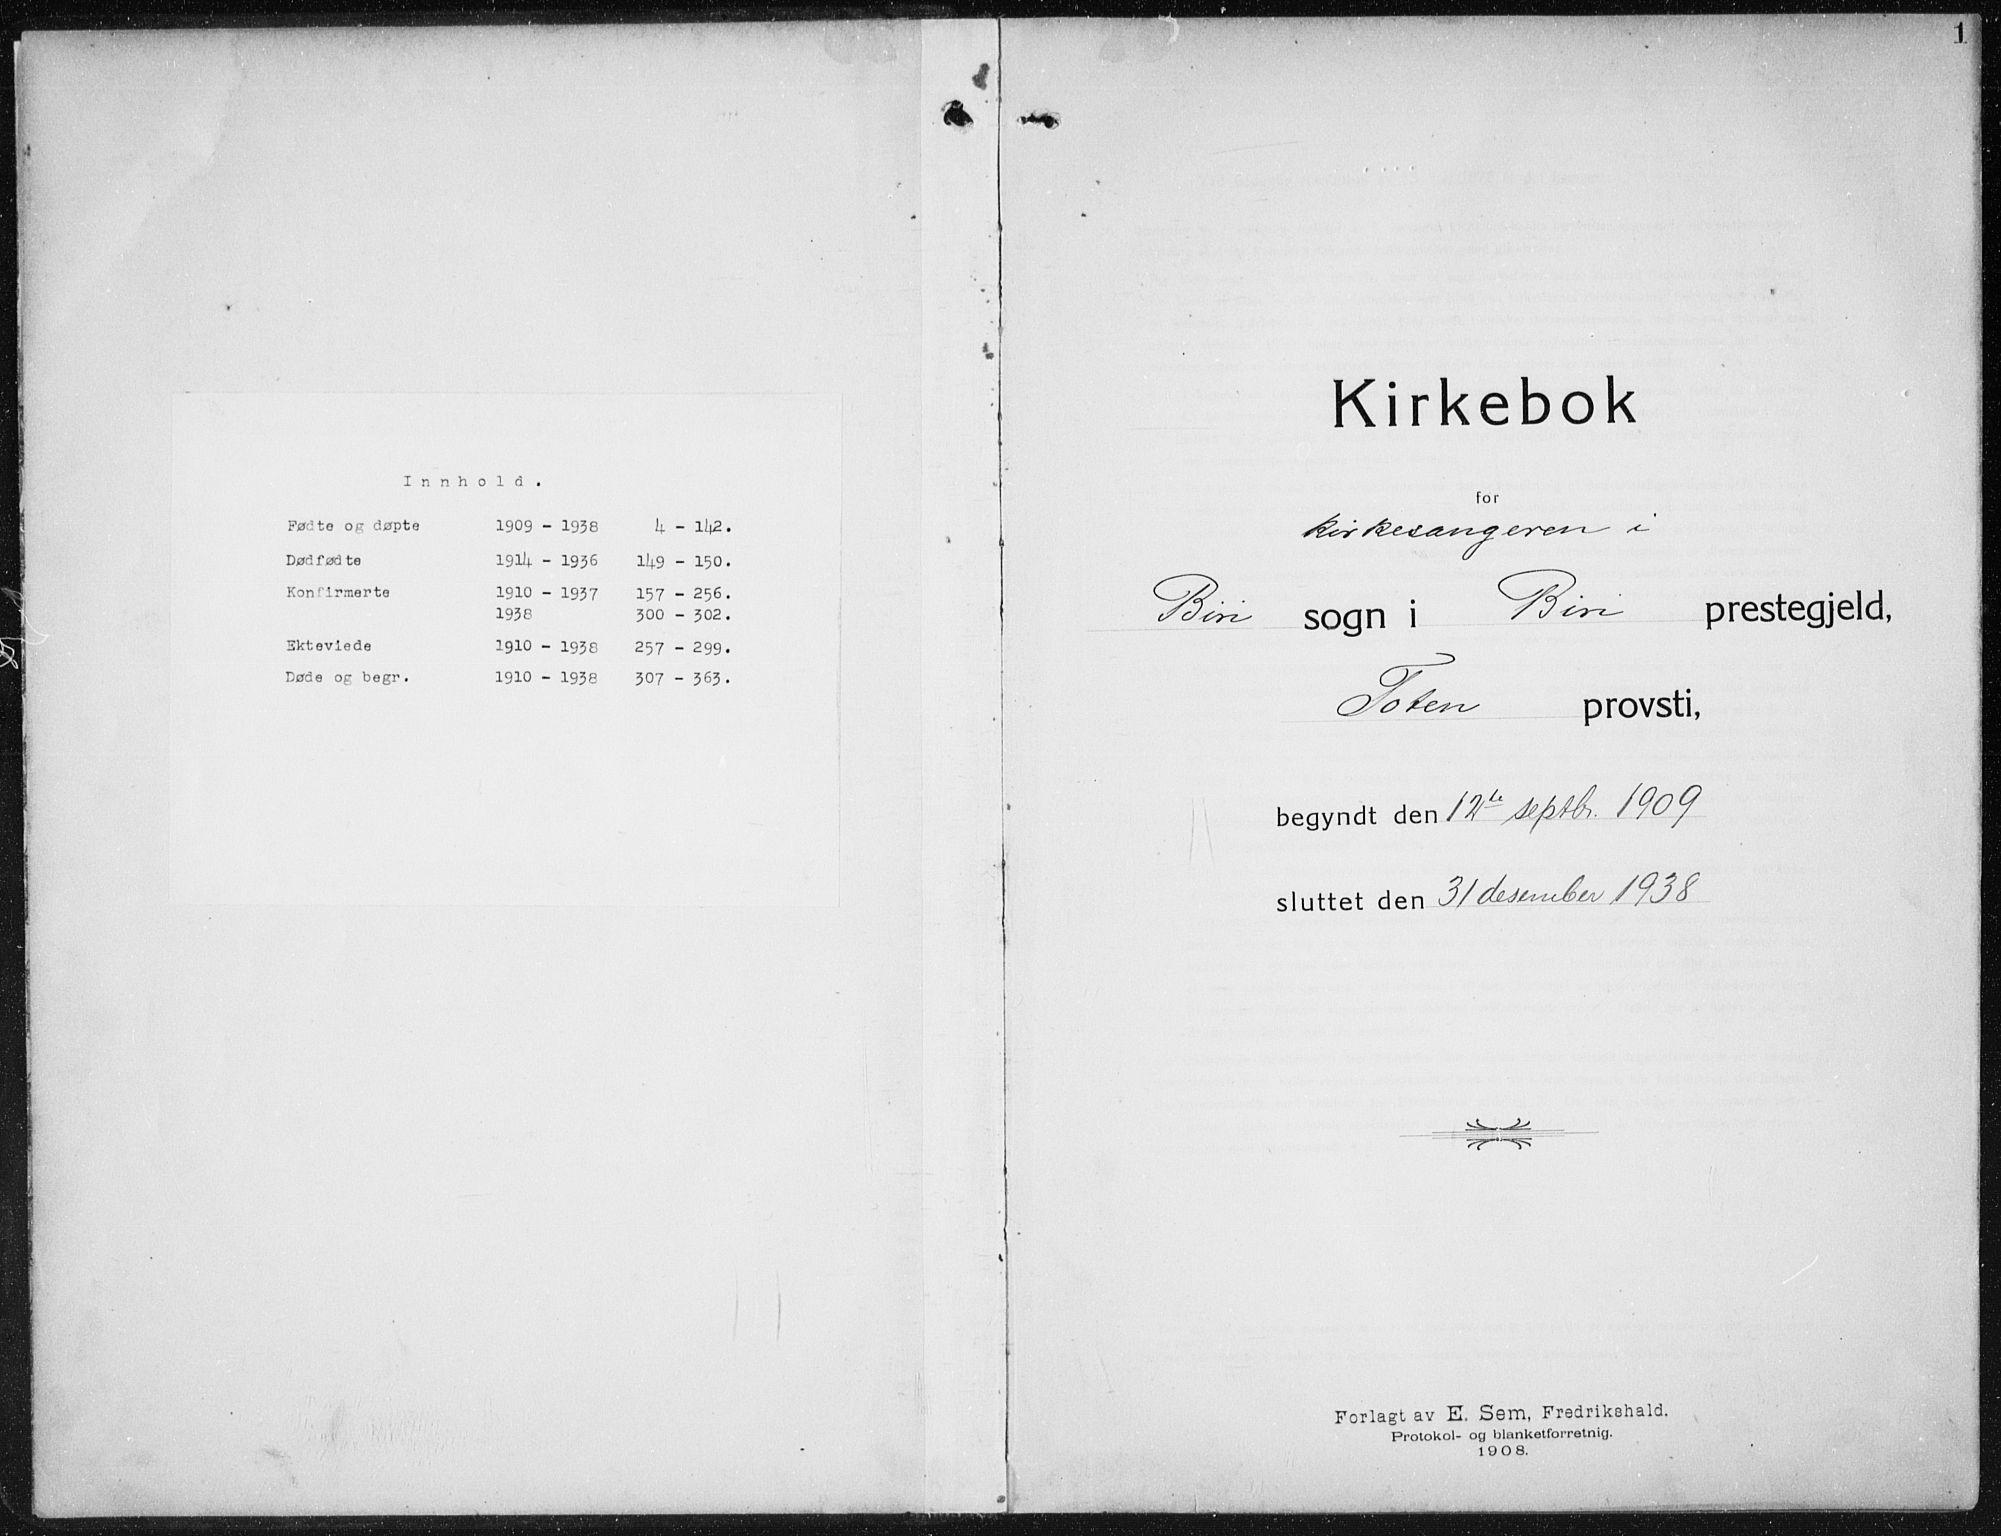 SAH, Biri prestekontor, Klokkerbok nr. 6, 1909-1938, s. 1